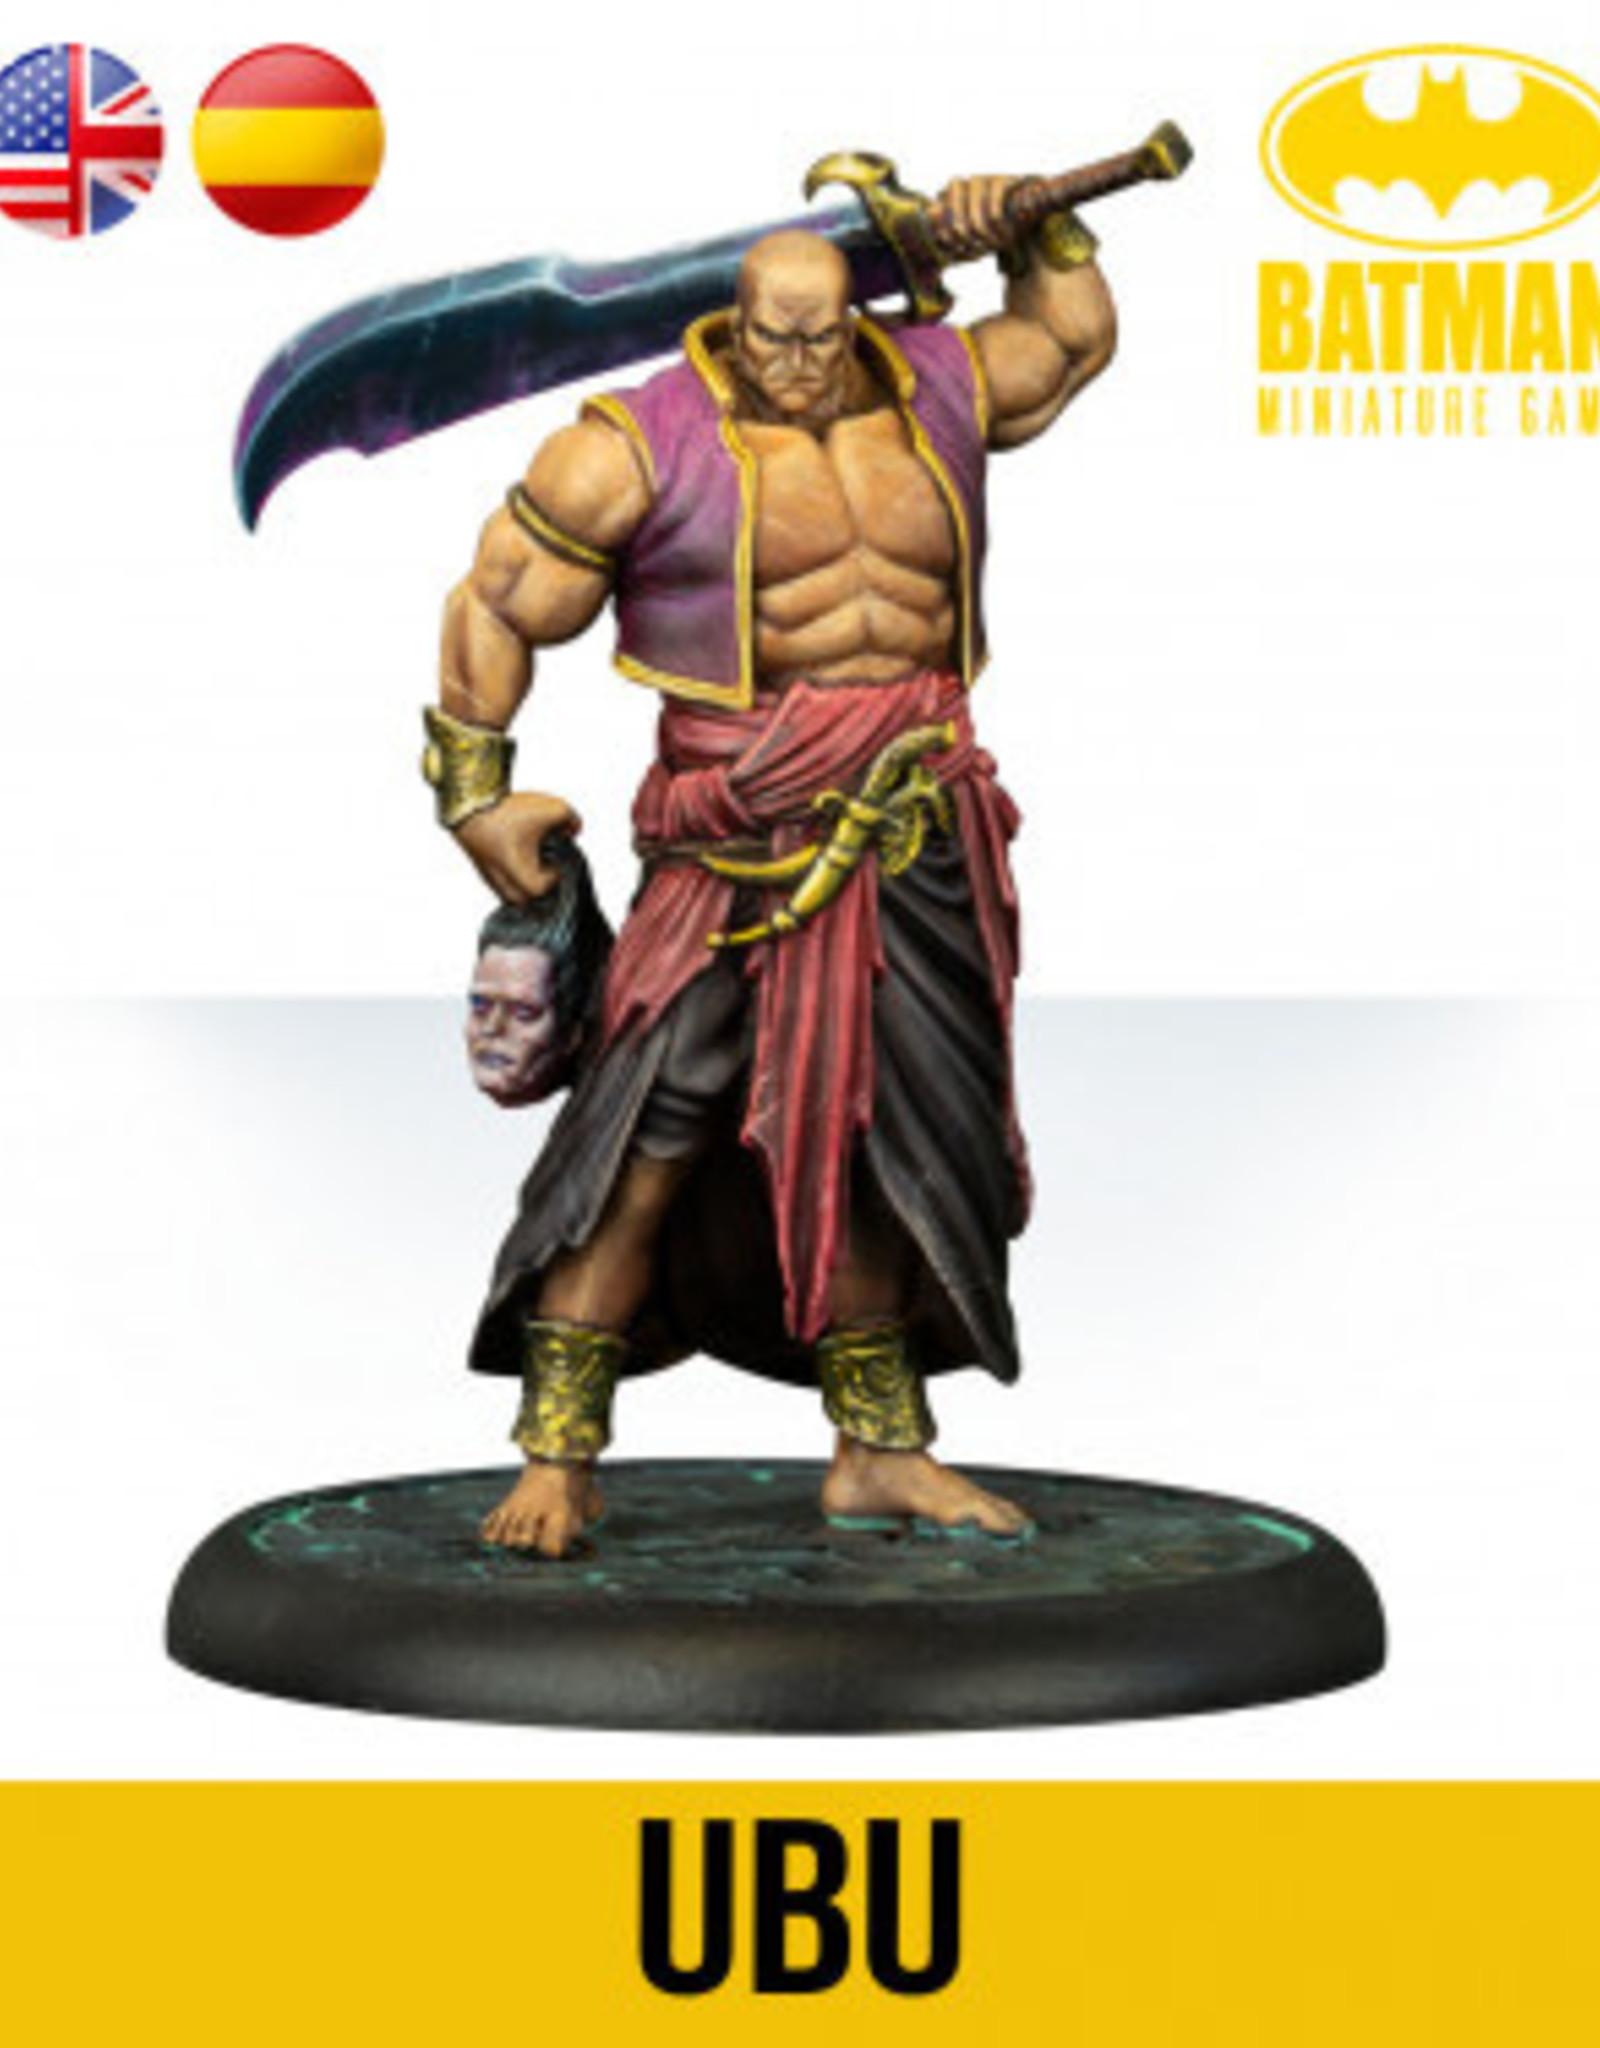 Batman Miniature Game: UBU